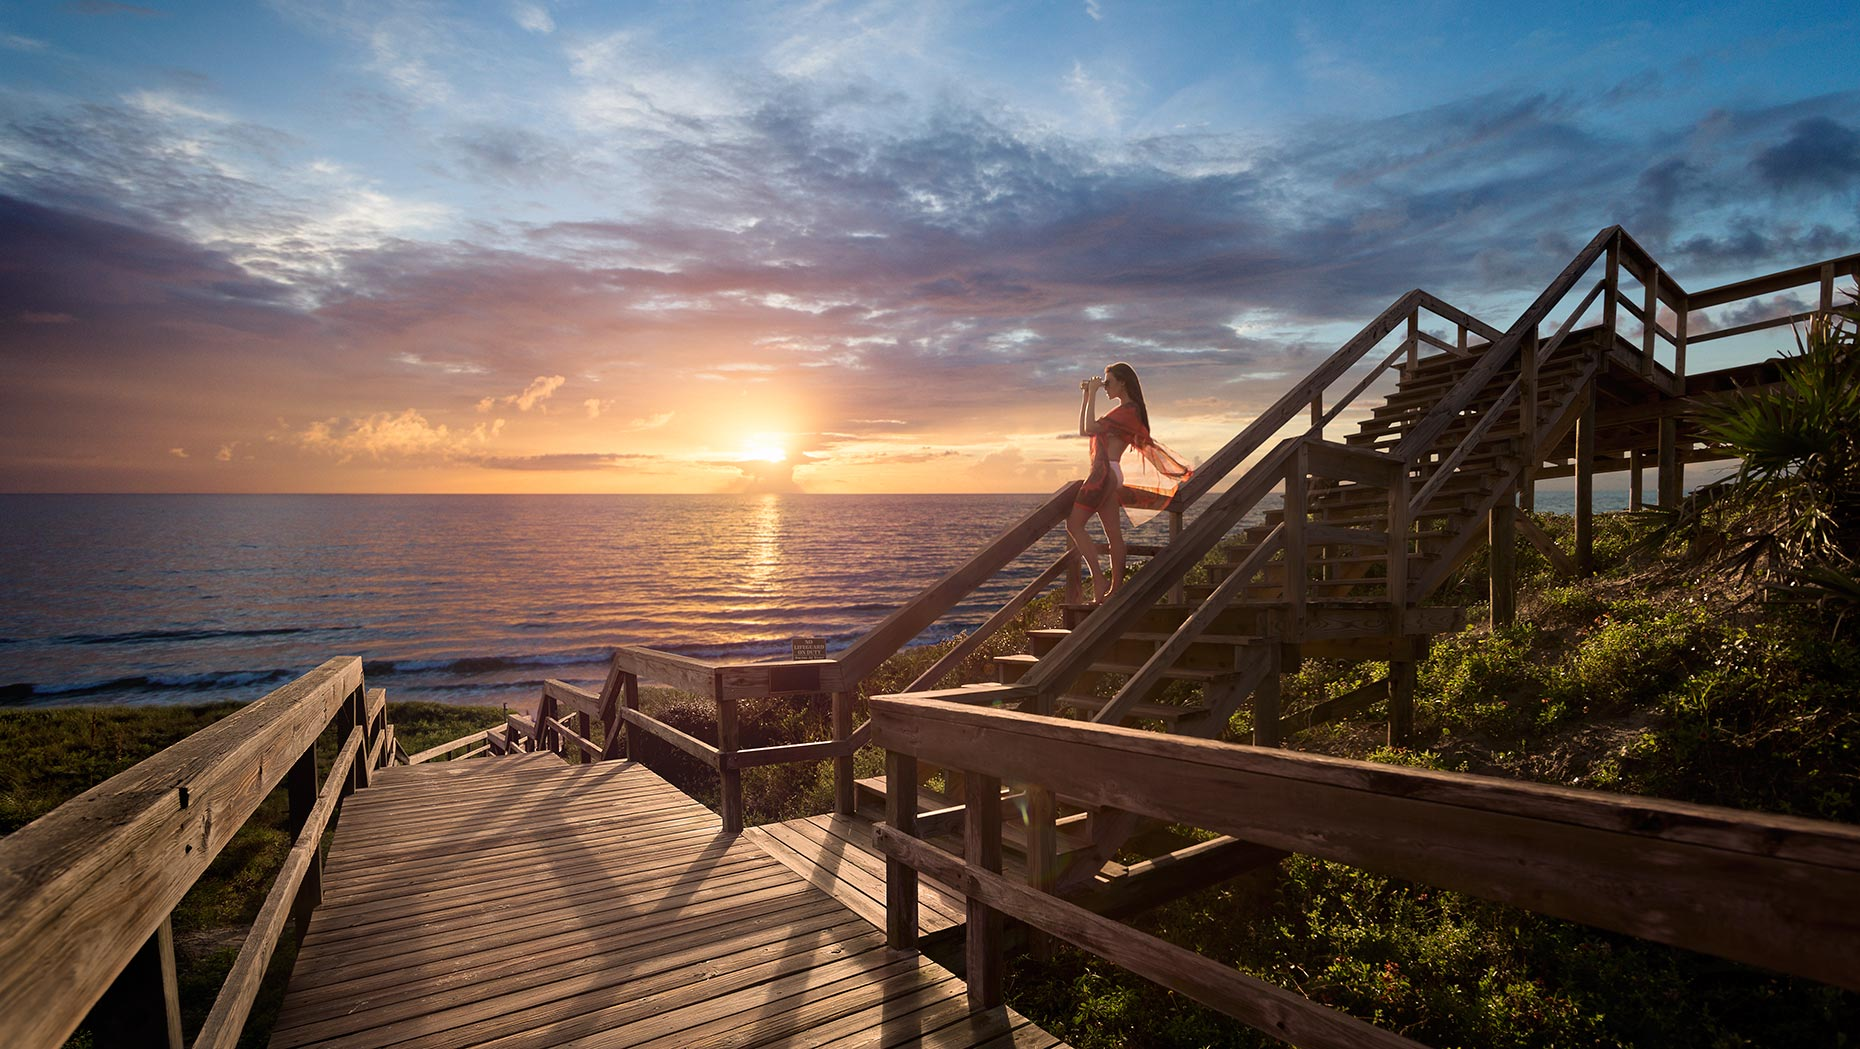 ST. AUGUSTINE- PONTE VEDRA FLORIDA TOURISM  LOCATION: PONTE VEDRA, FLORIDA